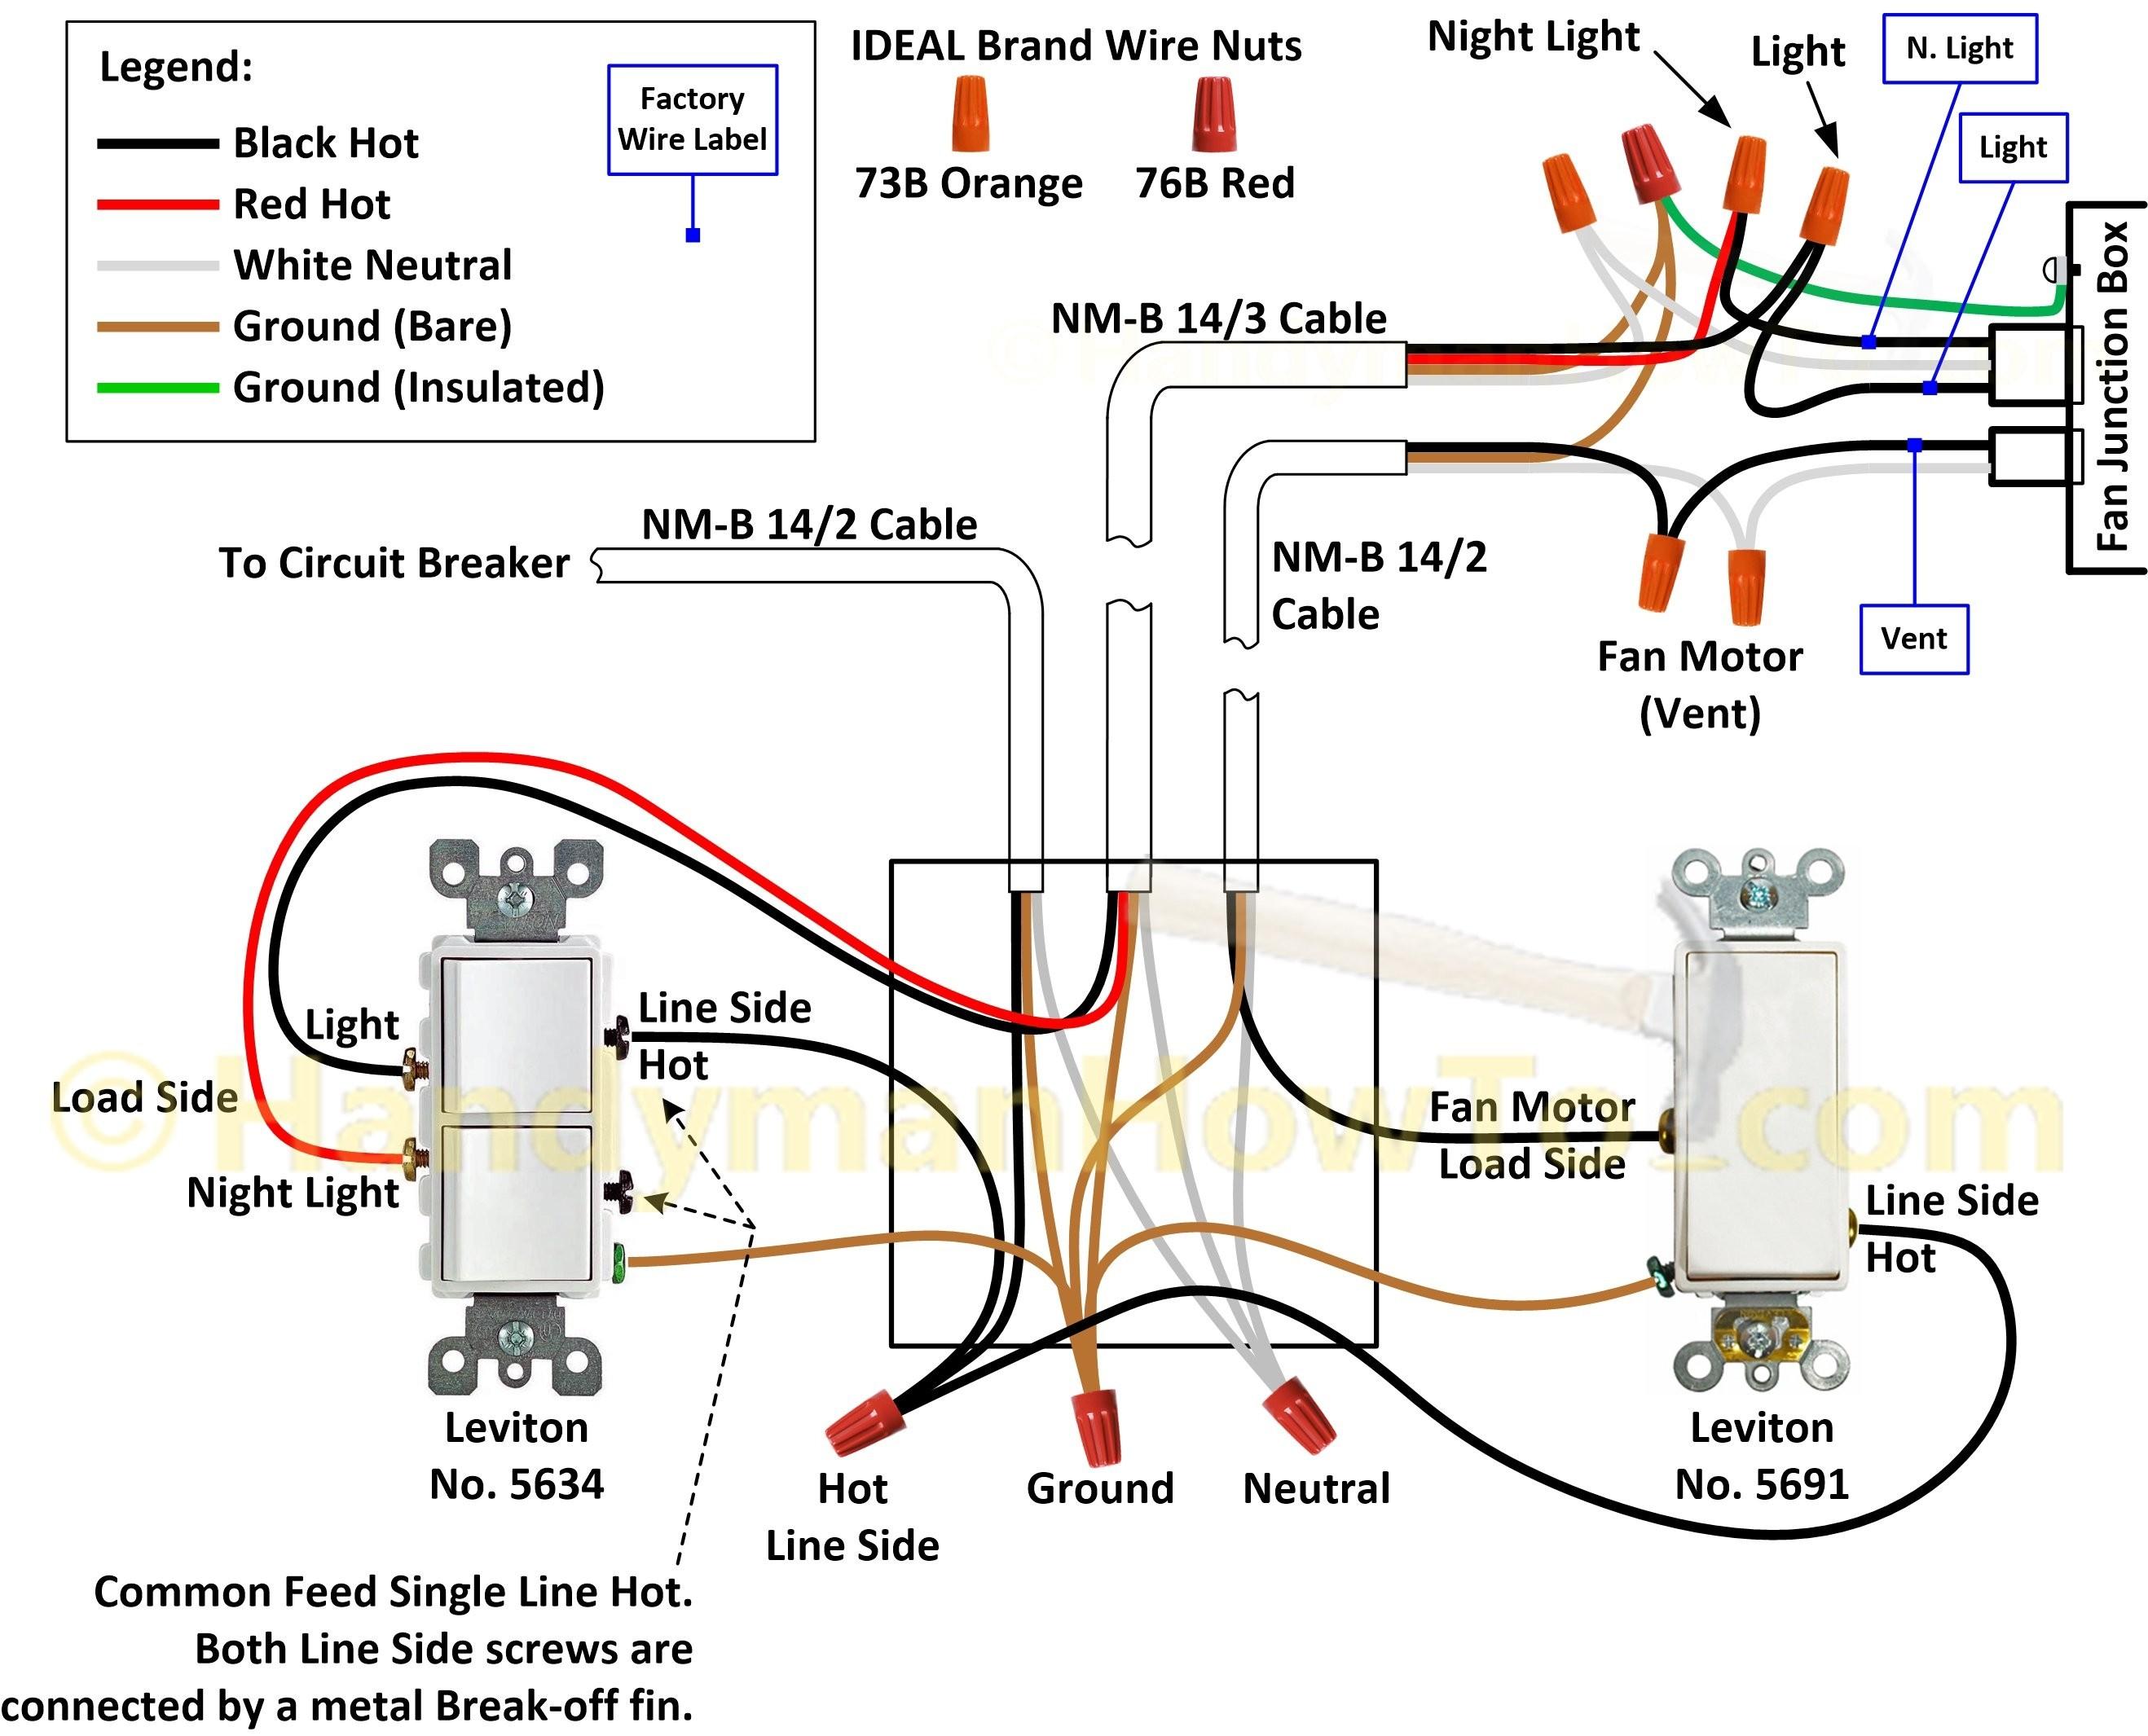 Isuzu Rodeo Engine Diagram Wiring A Bathroom Fan and Light Diagram Wiring Diagram Of Isuzu Rodeo Engine Diagram